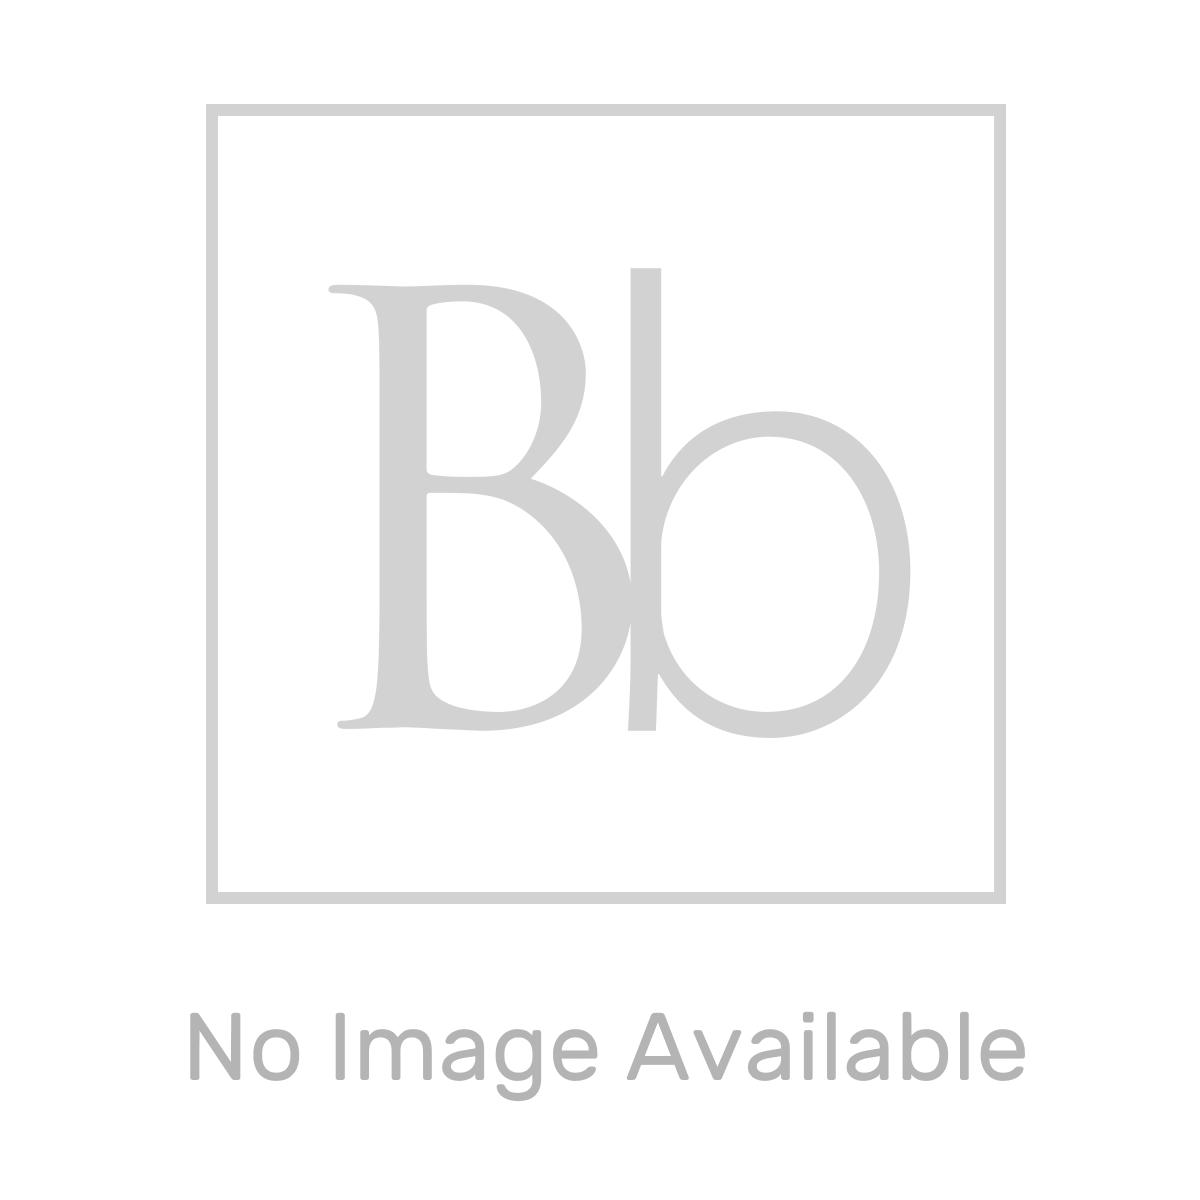 Merlyn Series 8 Frameless Hinged Shower Door with Optional Side Panel